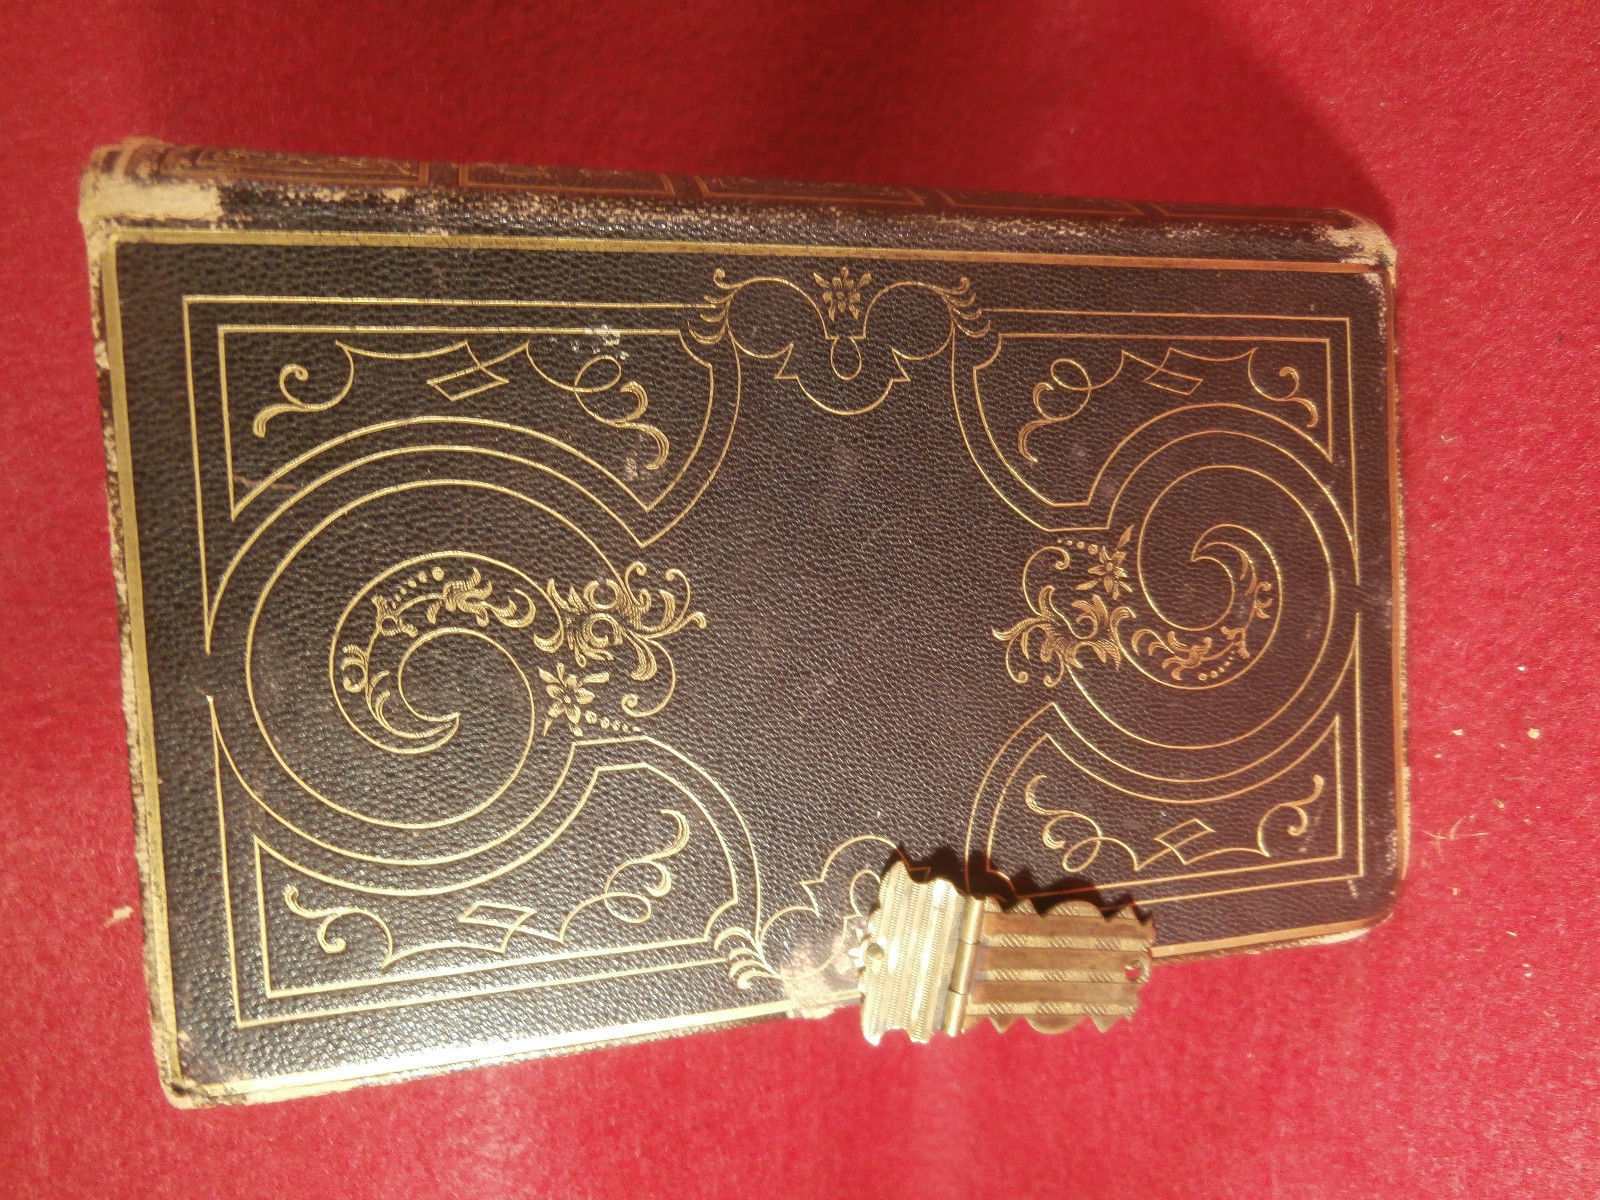 "Antique Leather Bound Book Methodist Hymns 1849 Brown 4 1/4"" X 61/4"" w/ Clasp"